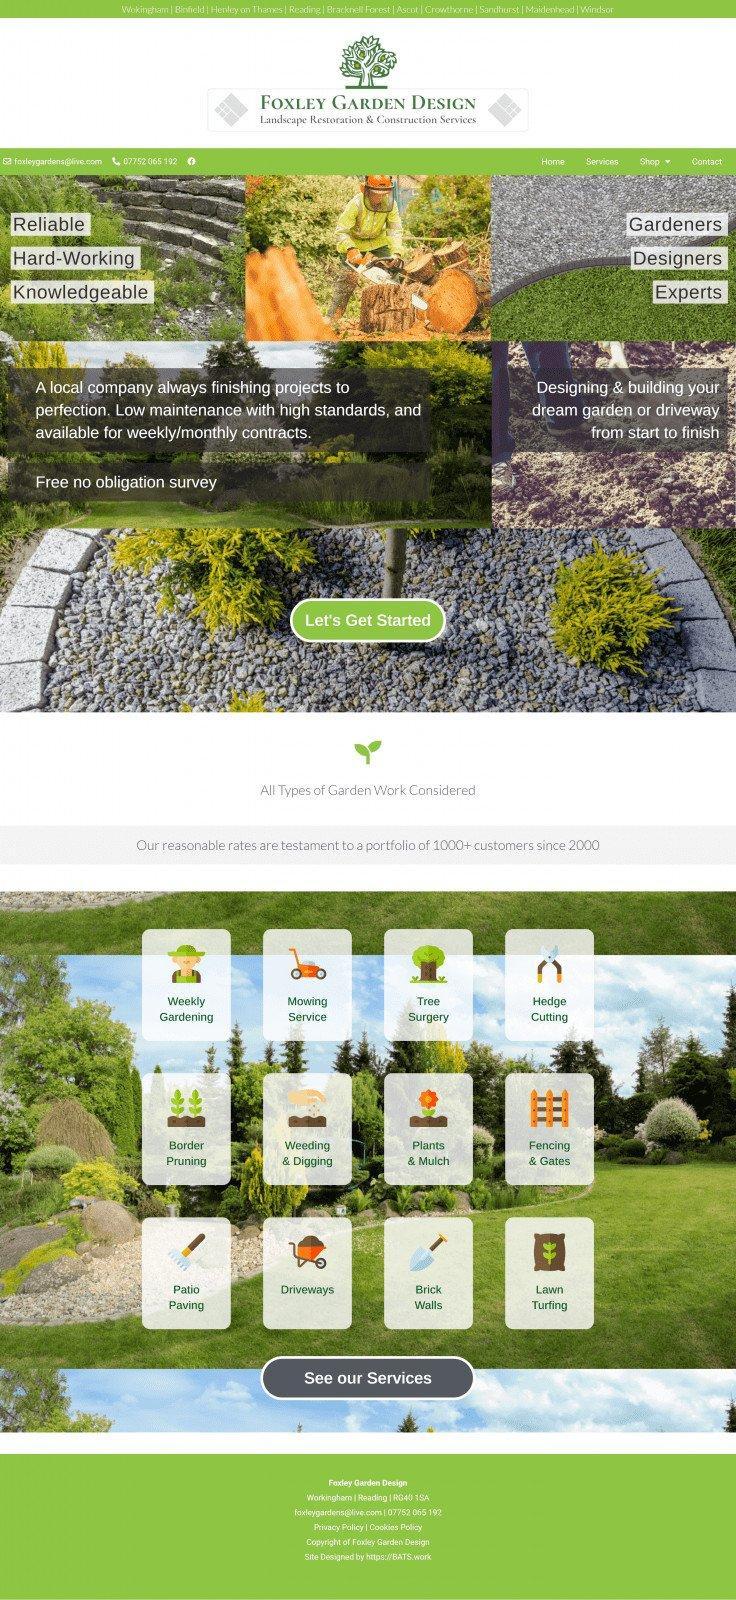 Foxley garden Design